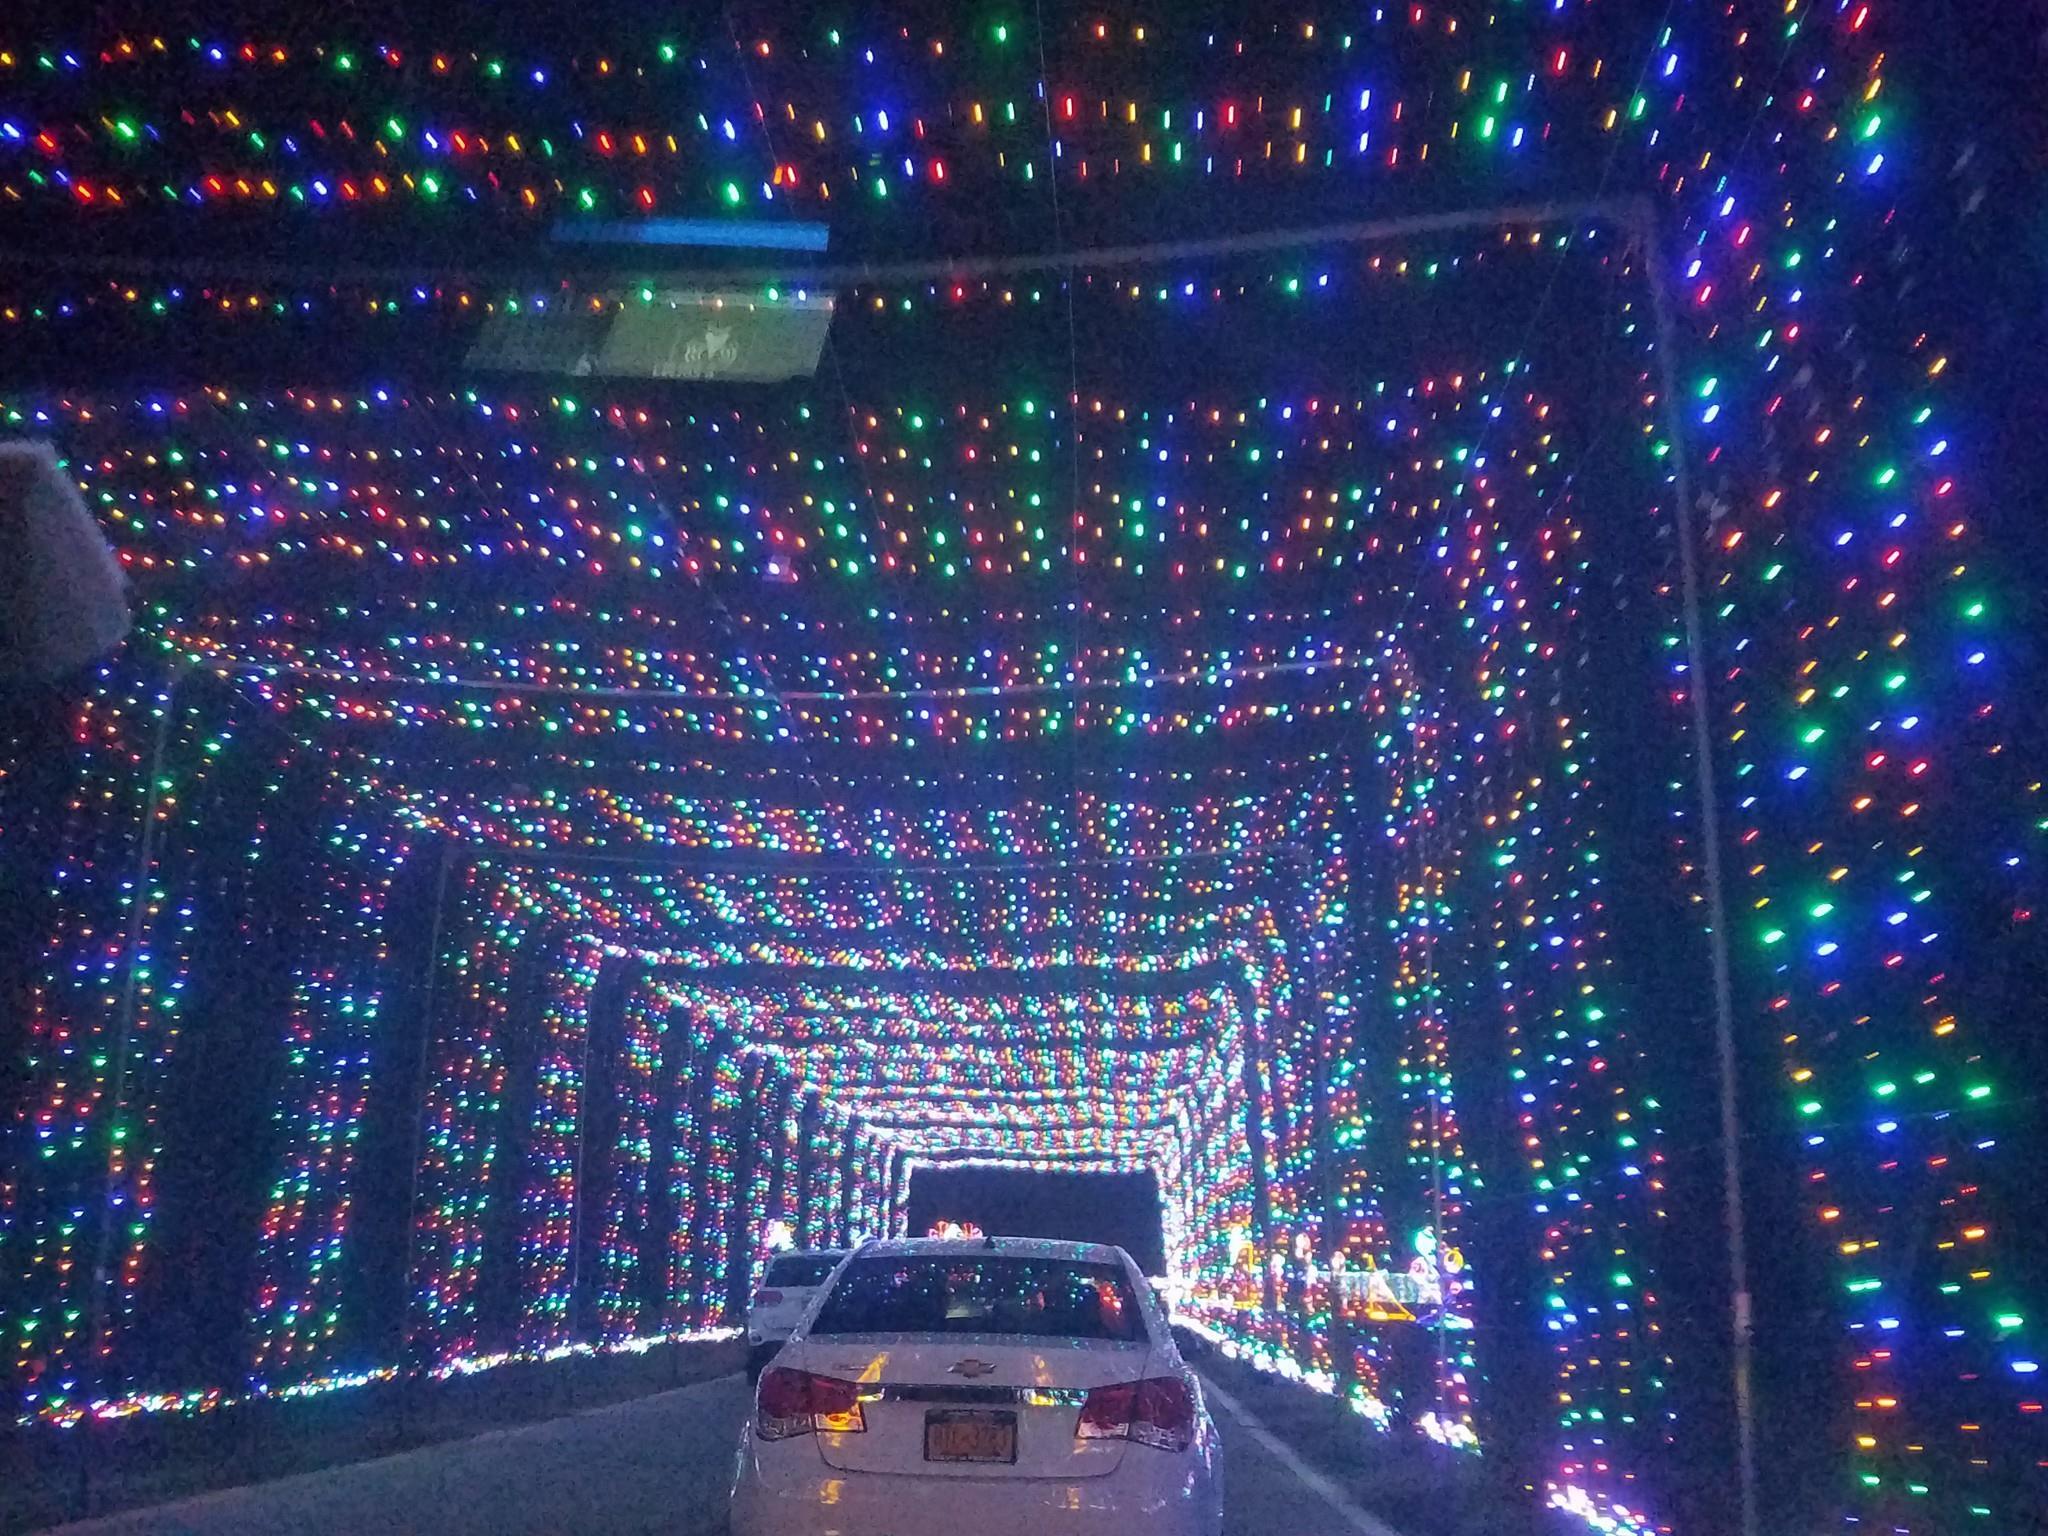 Jones Beach Christmas Lights 2020 Jones Beach Christmas Lights 2020/16 Kits | Hqznvx.2020newyear.site